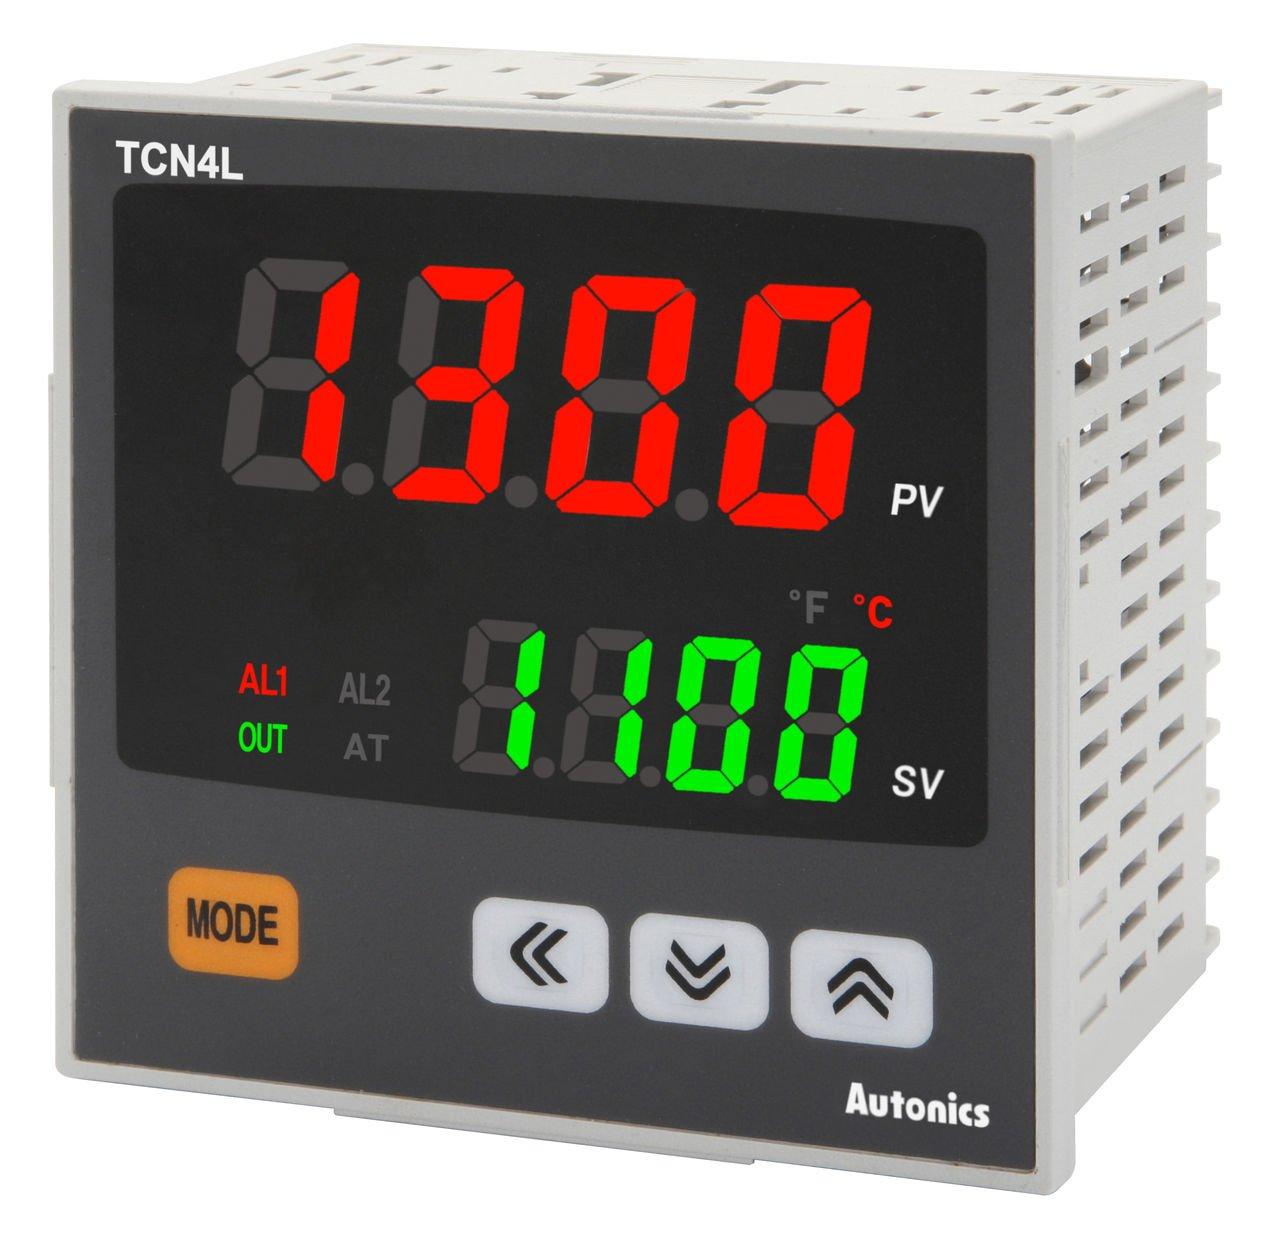 Autonics TCN4L-24R Temp Control, 1/4DIN, Dual display 4 Digit, PID Control, Relay & SSR Output, 2 Alarm Output, 100-240 VAC